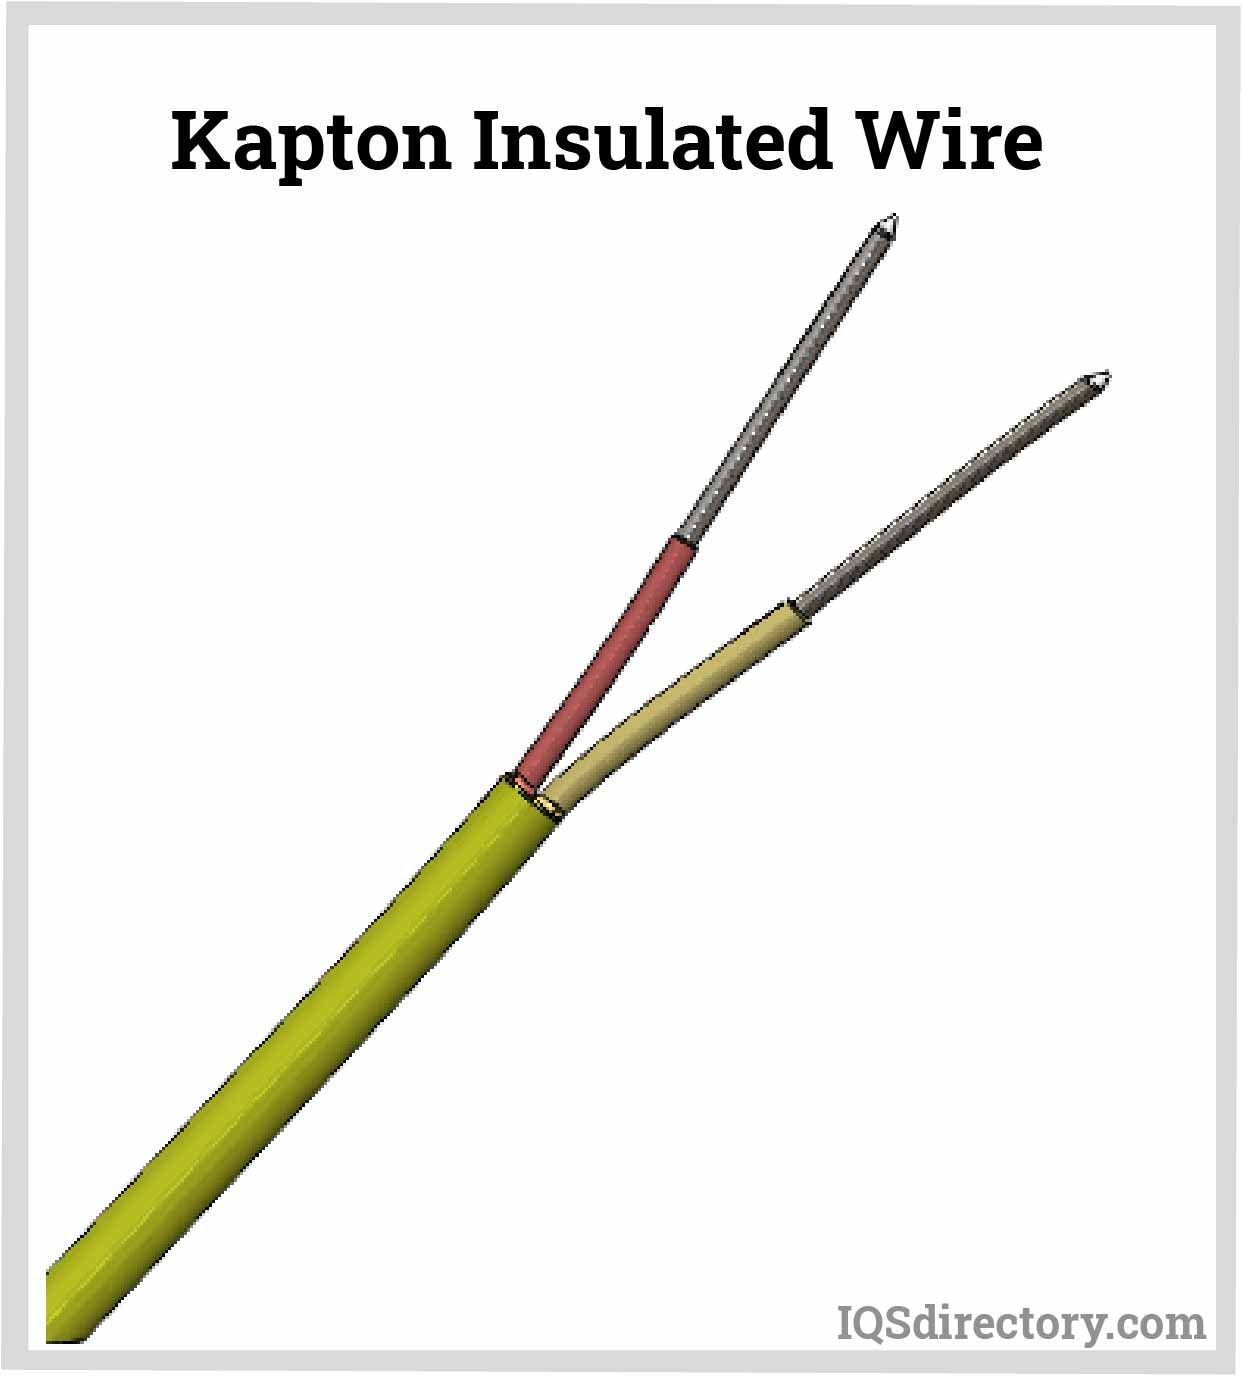 Kapton Insulated Wire